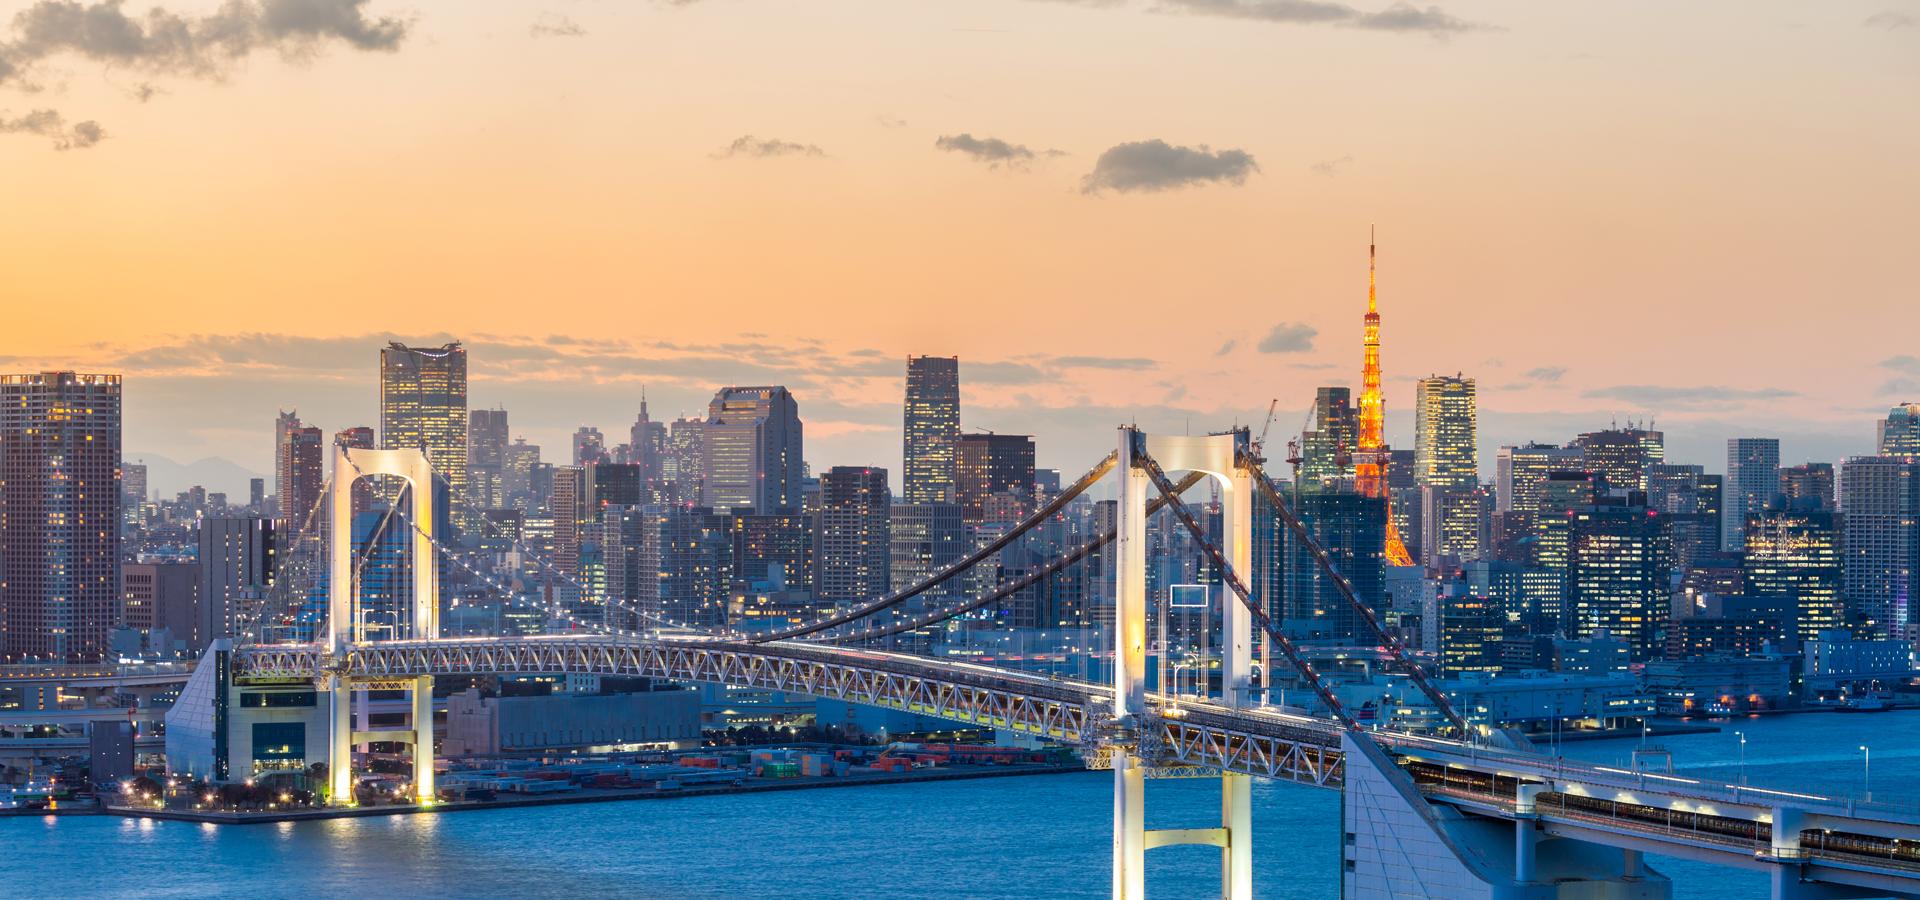 <b>Tokyo, Kantō Region, Japan</b>